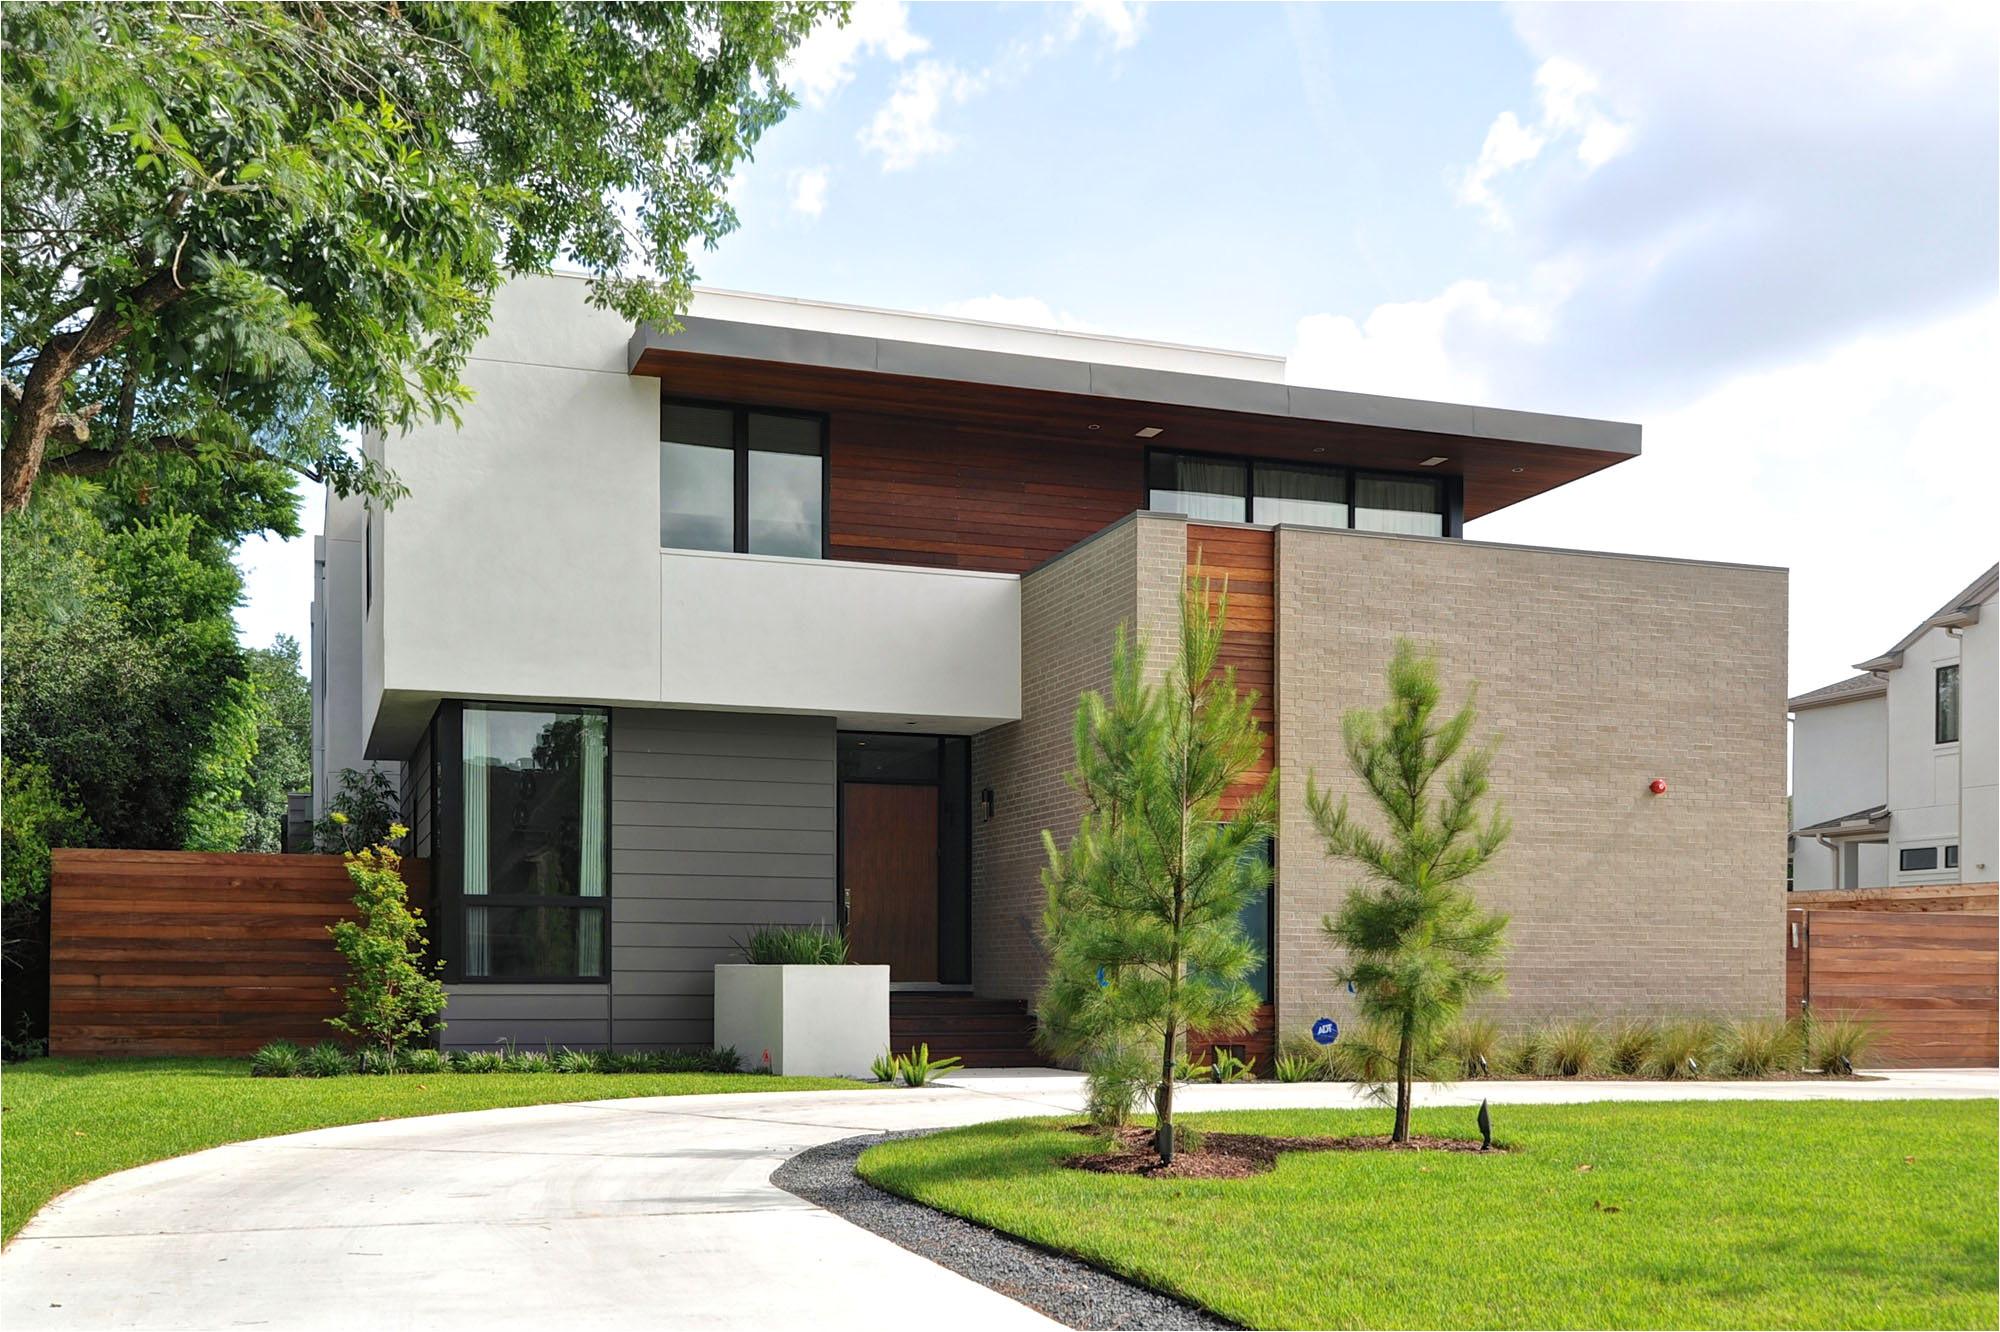 modern house houston architectural firm studiomet